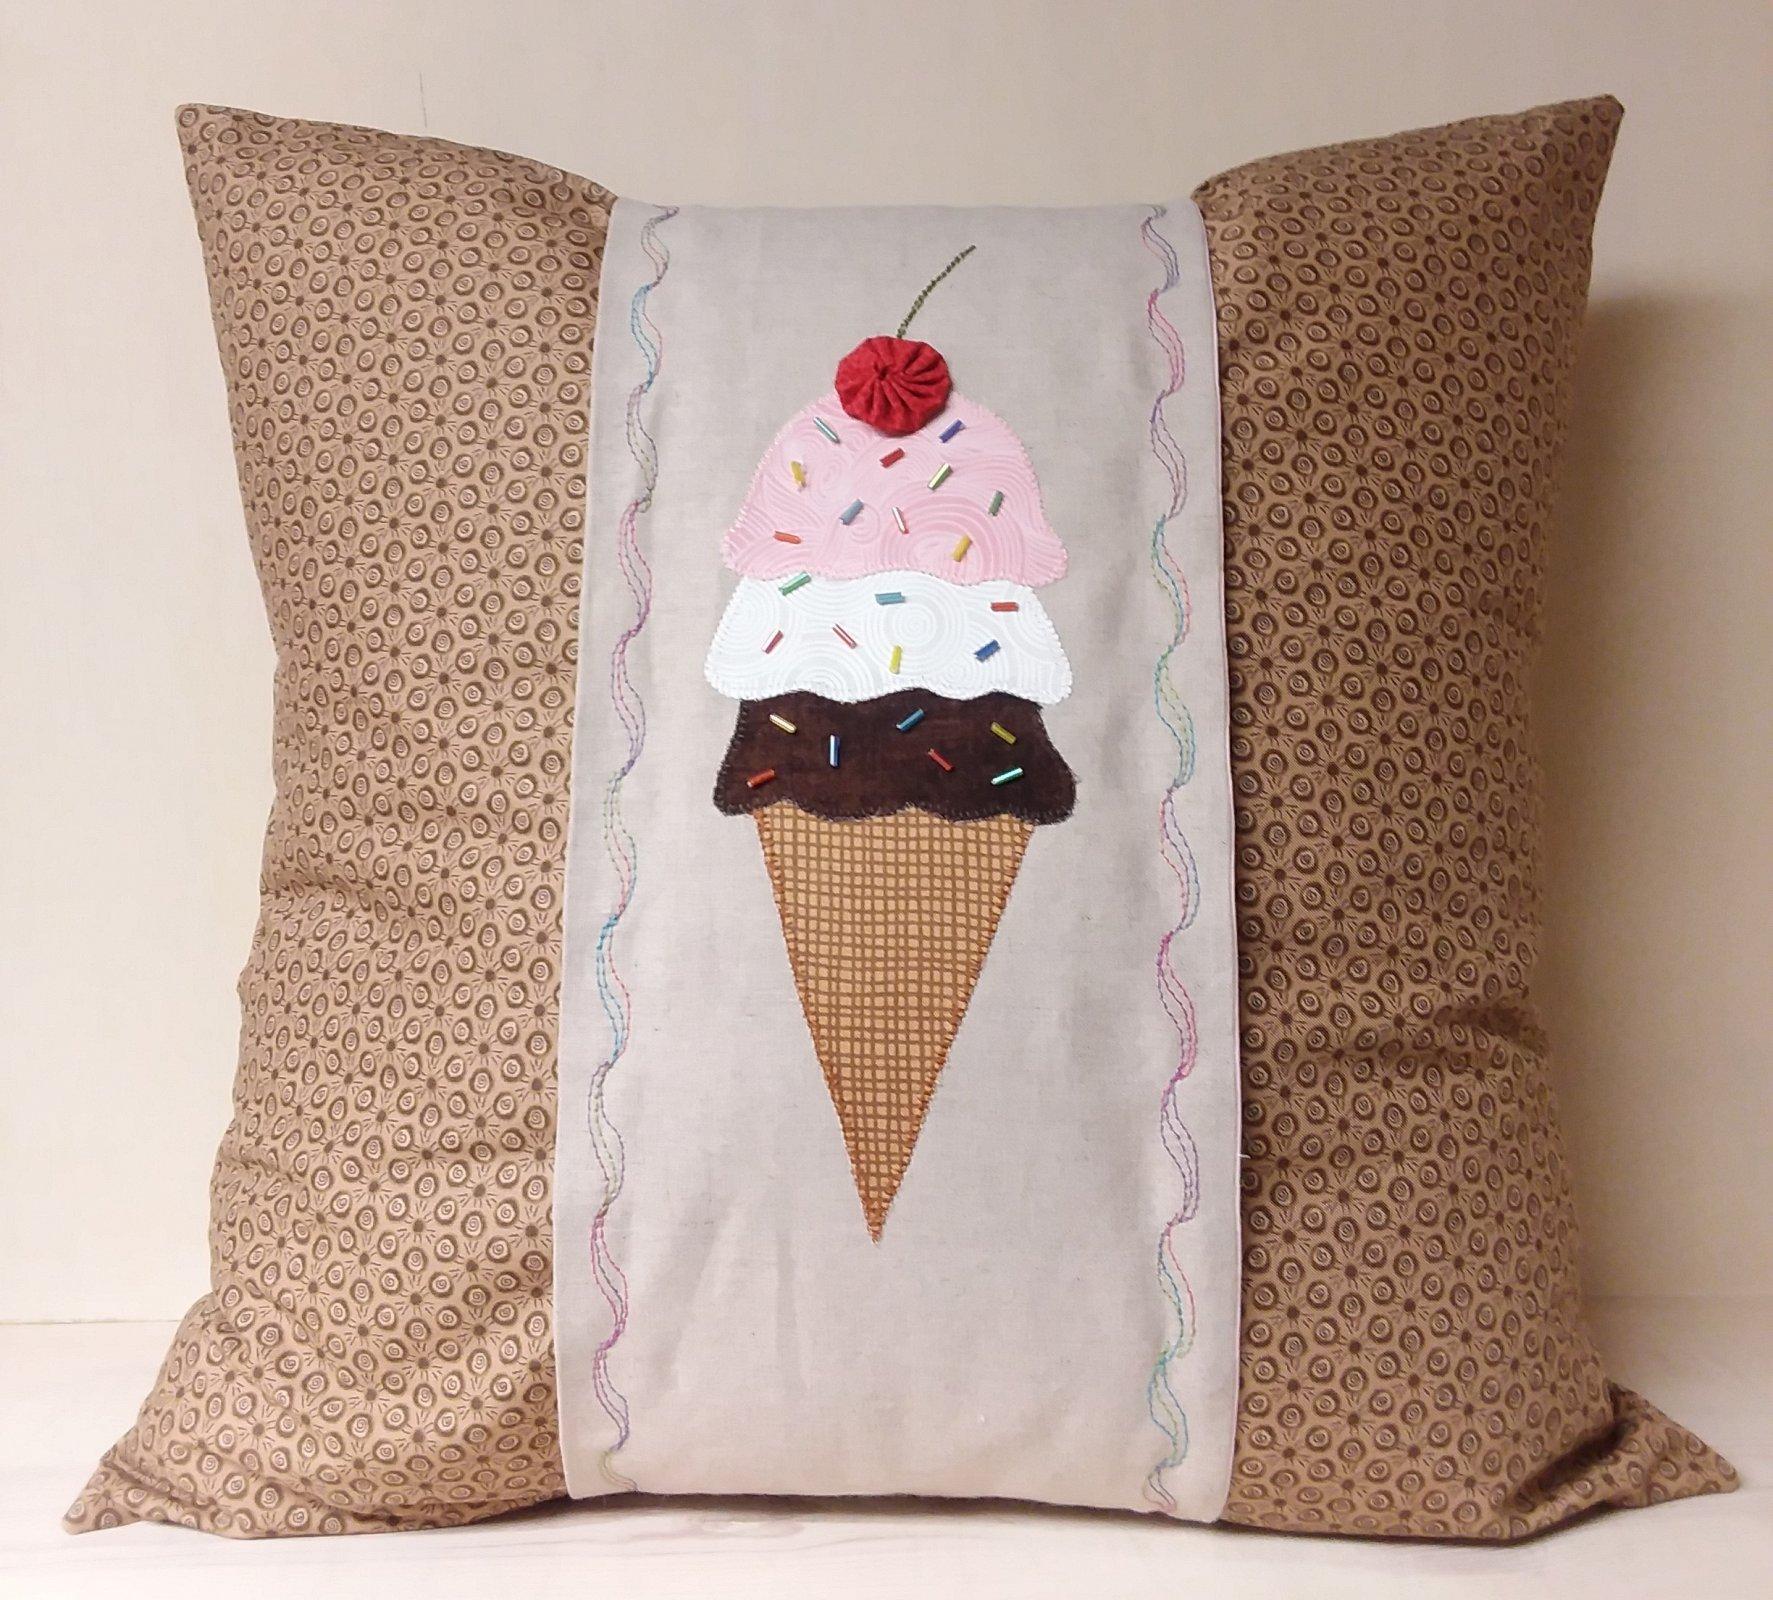 June Pillow Wrap Kit